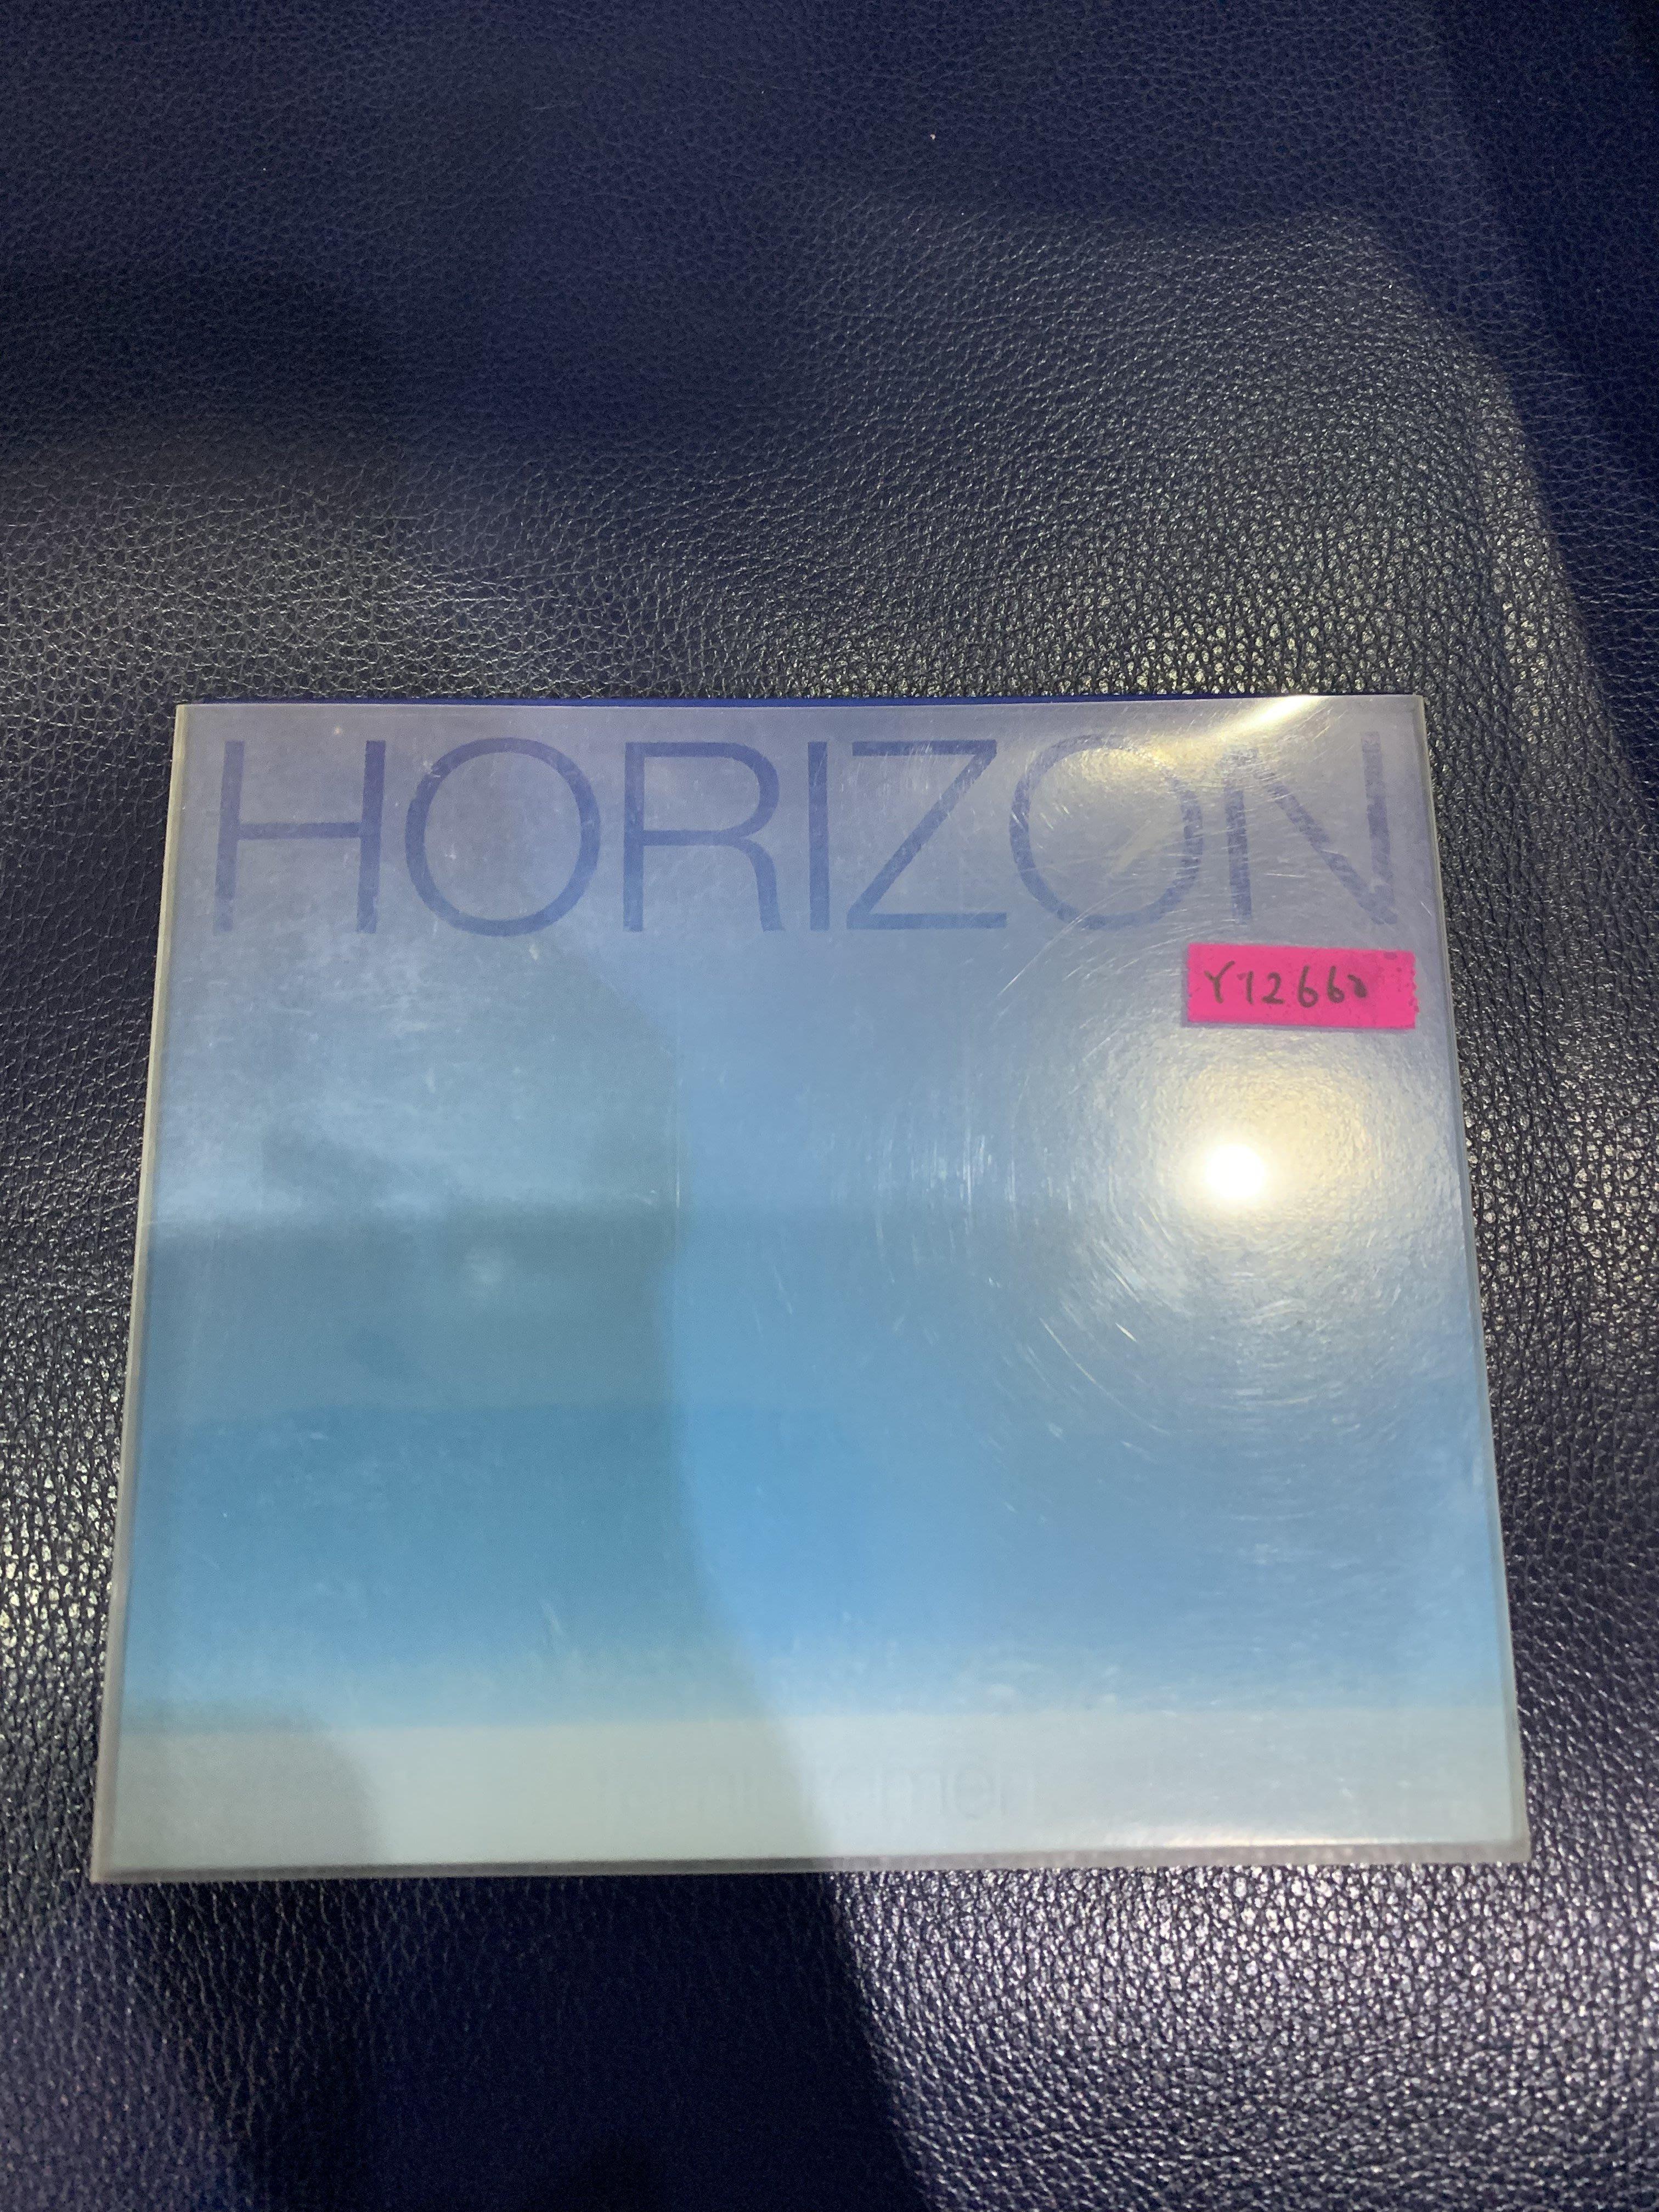 *還有唱片行*REMIOROMEN / HORIZON 日版 二手 Y12660 (149起拍)